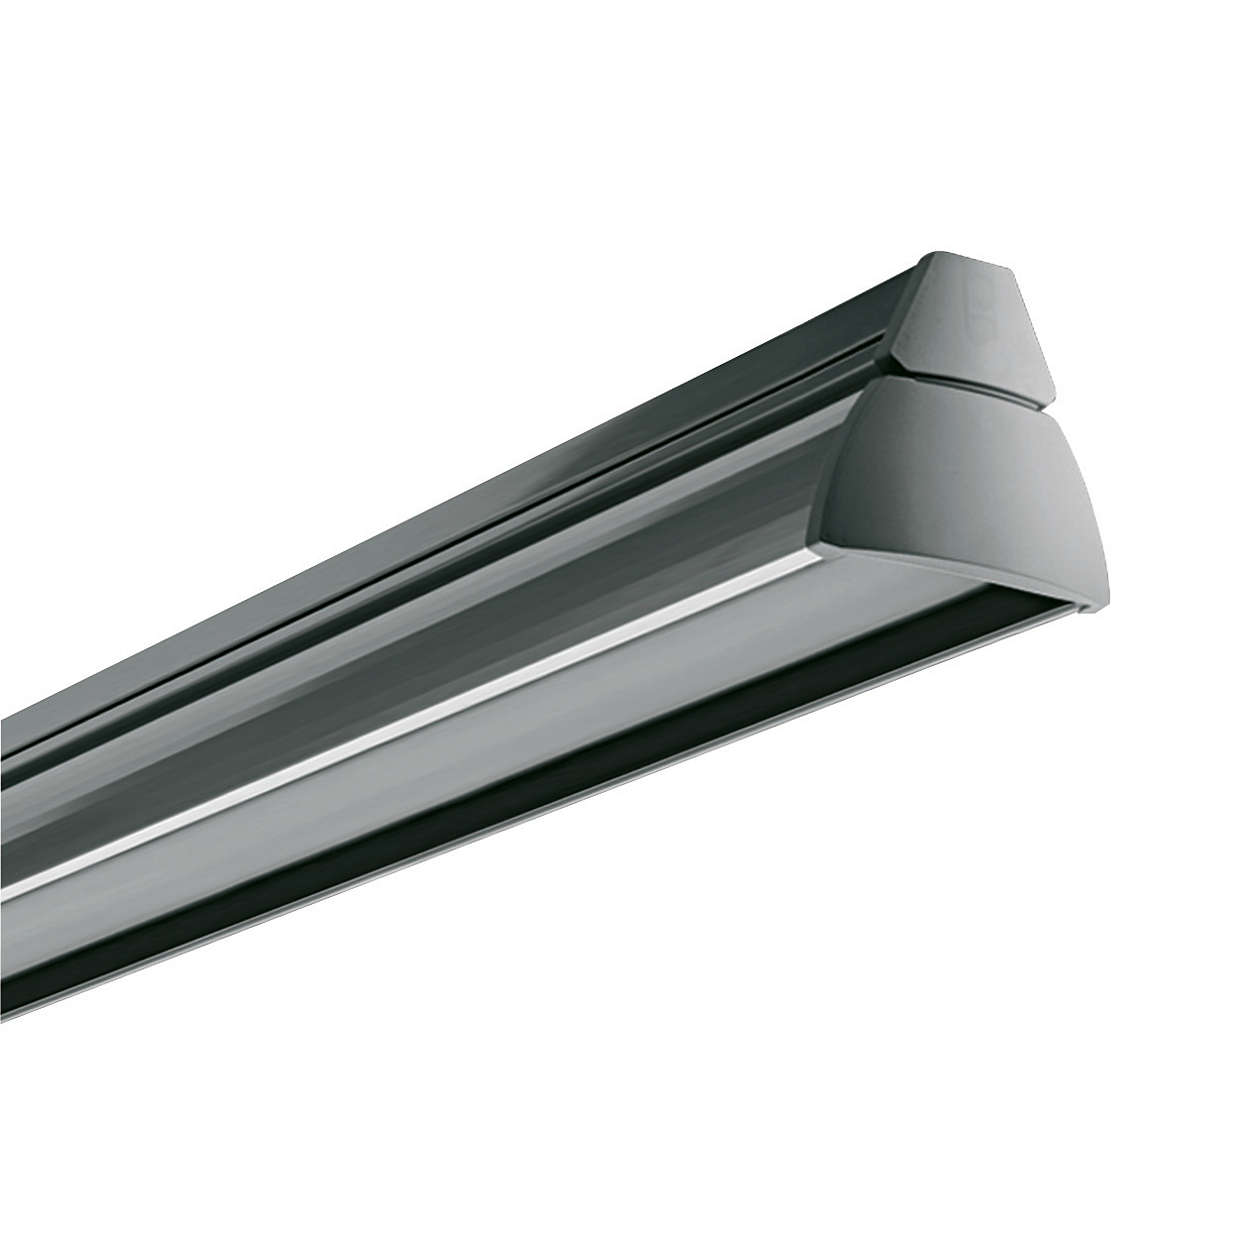 4MX692 – Reflectores faceteados TL5 4MX693 – Ópticas para reflectores faceteados TL5